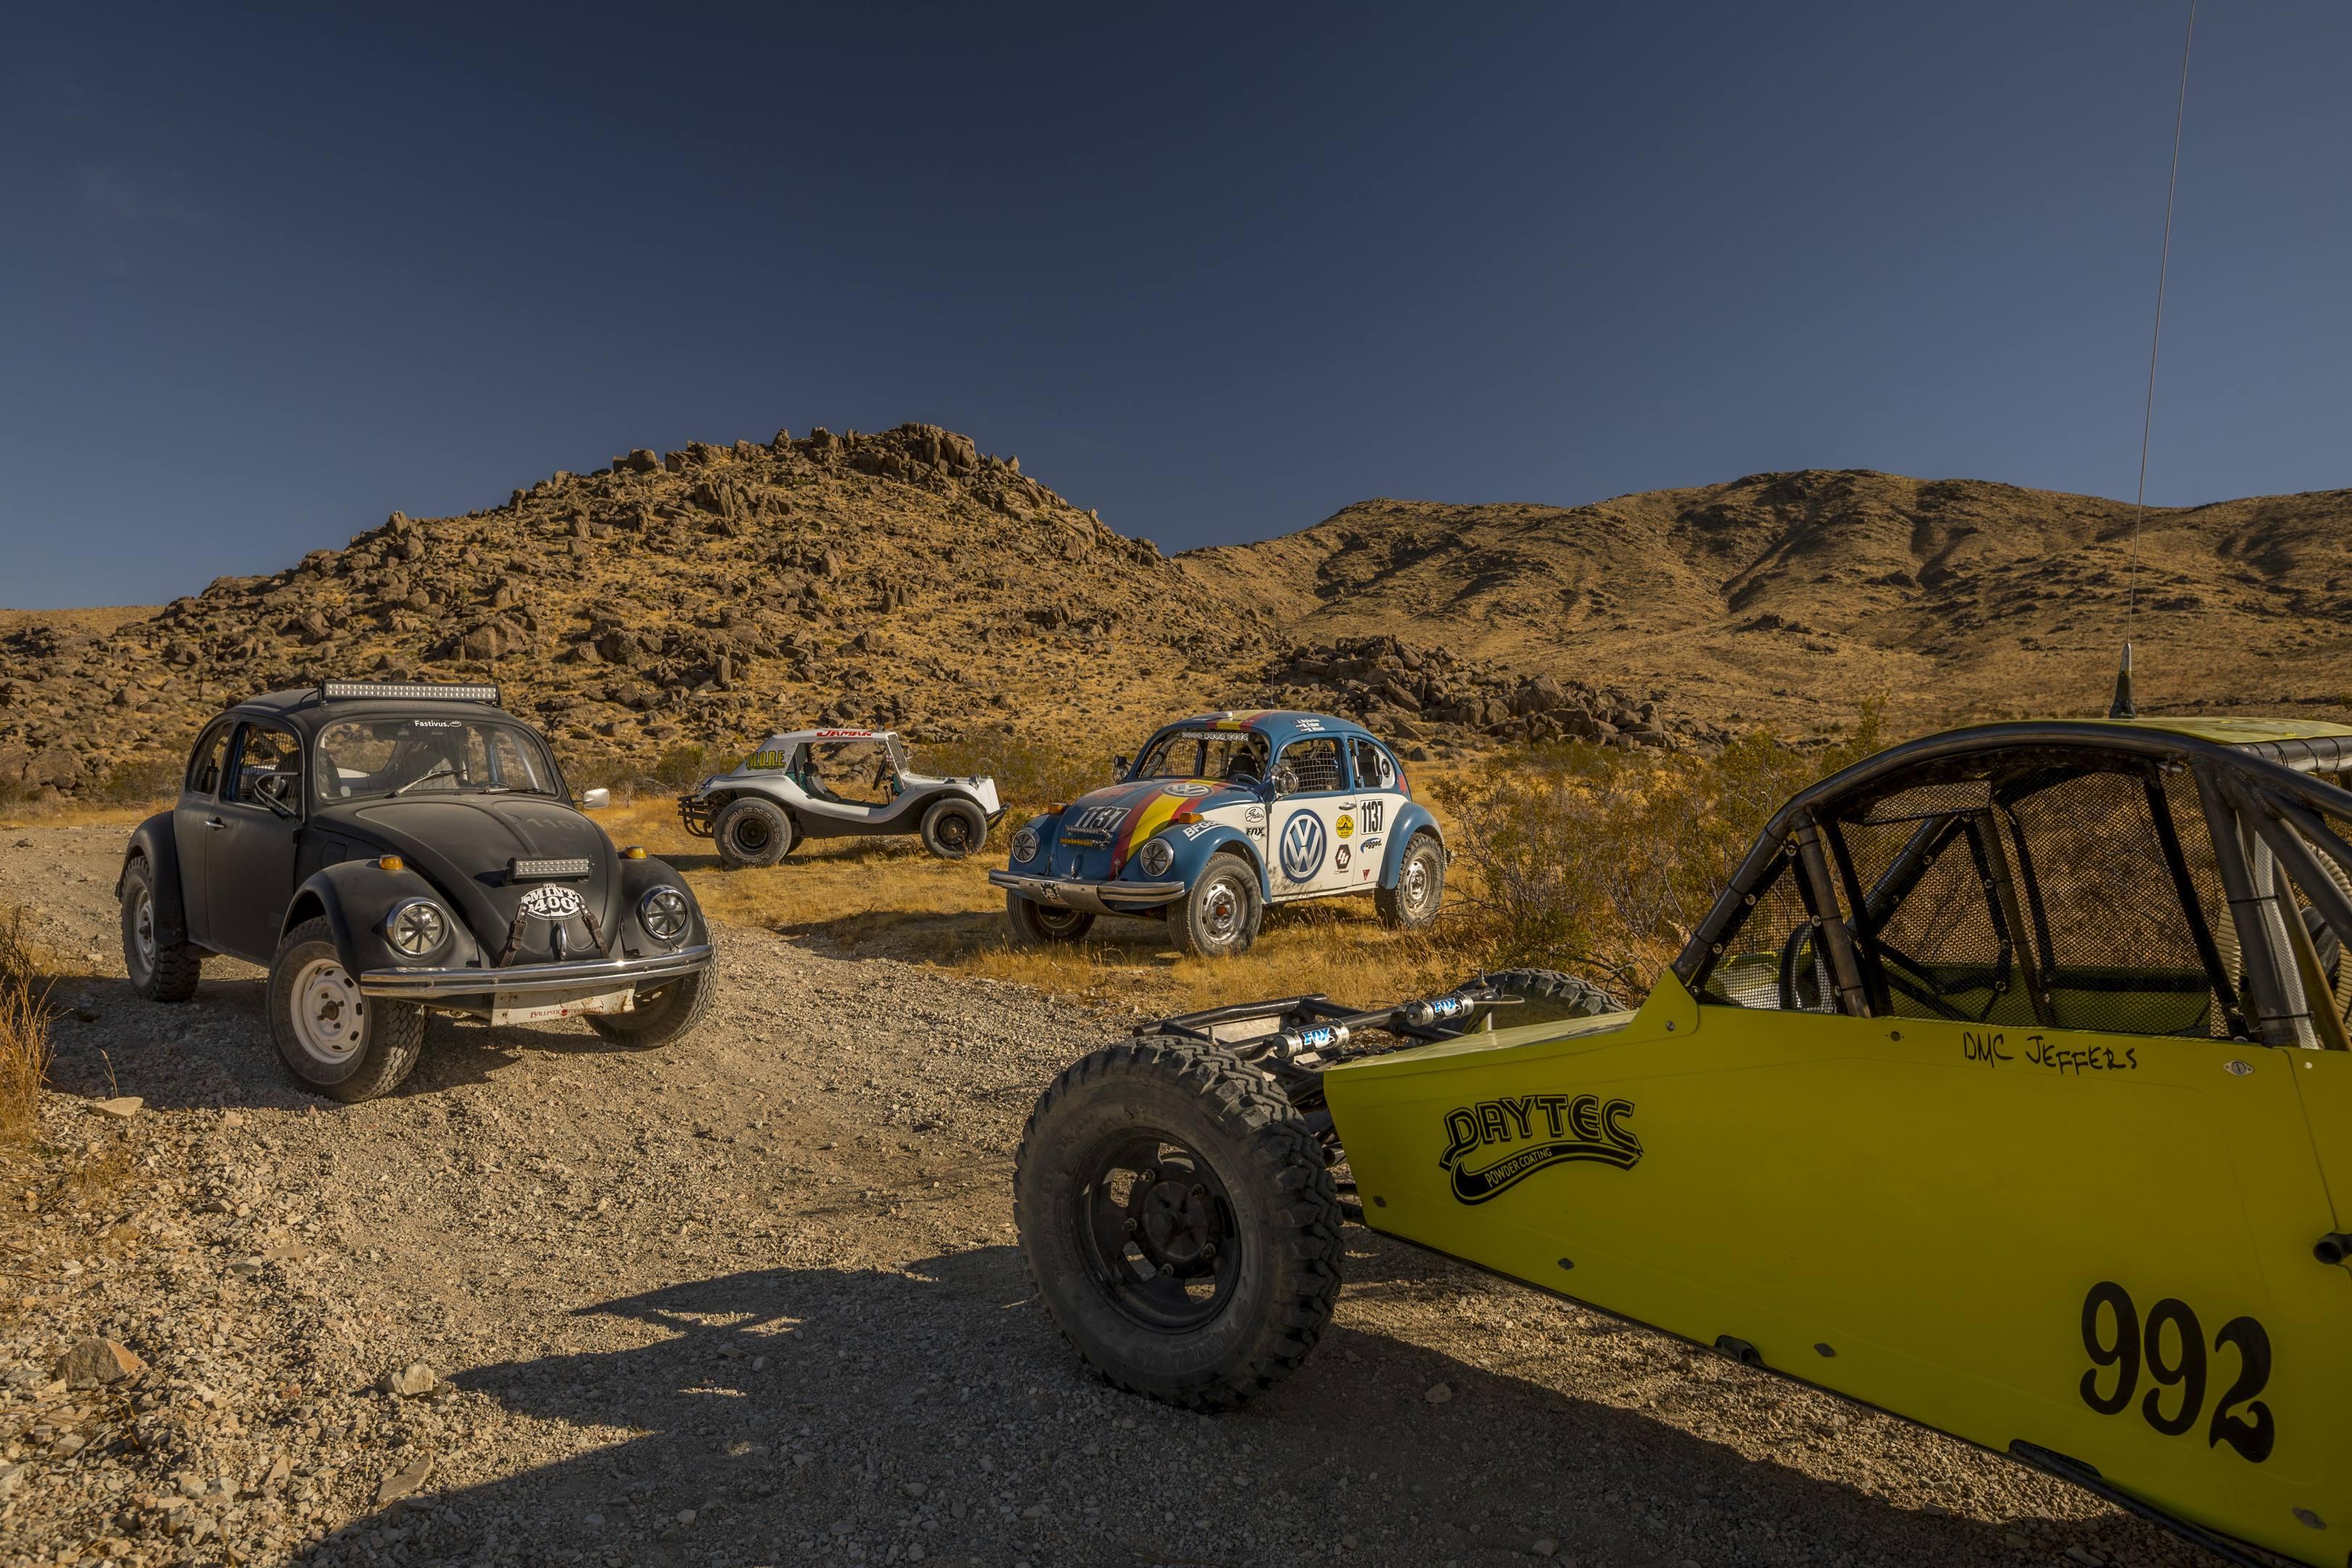 group of Volkswagens in the desert